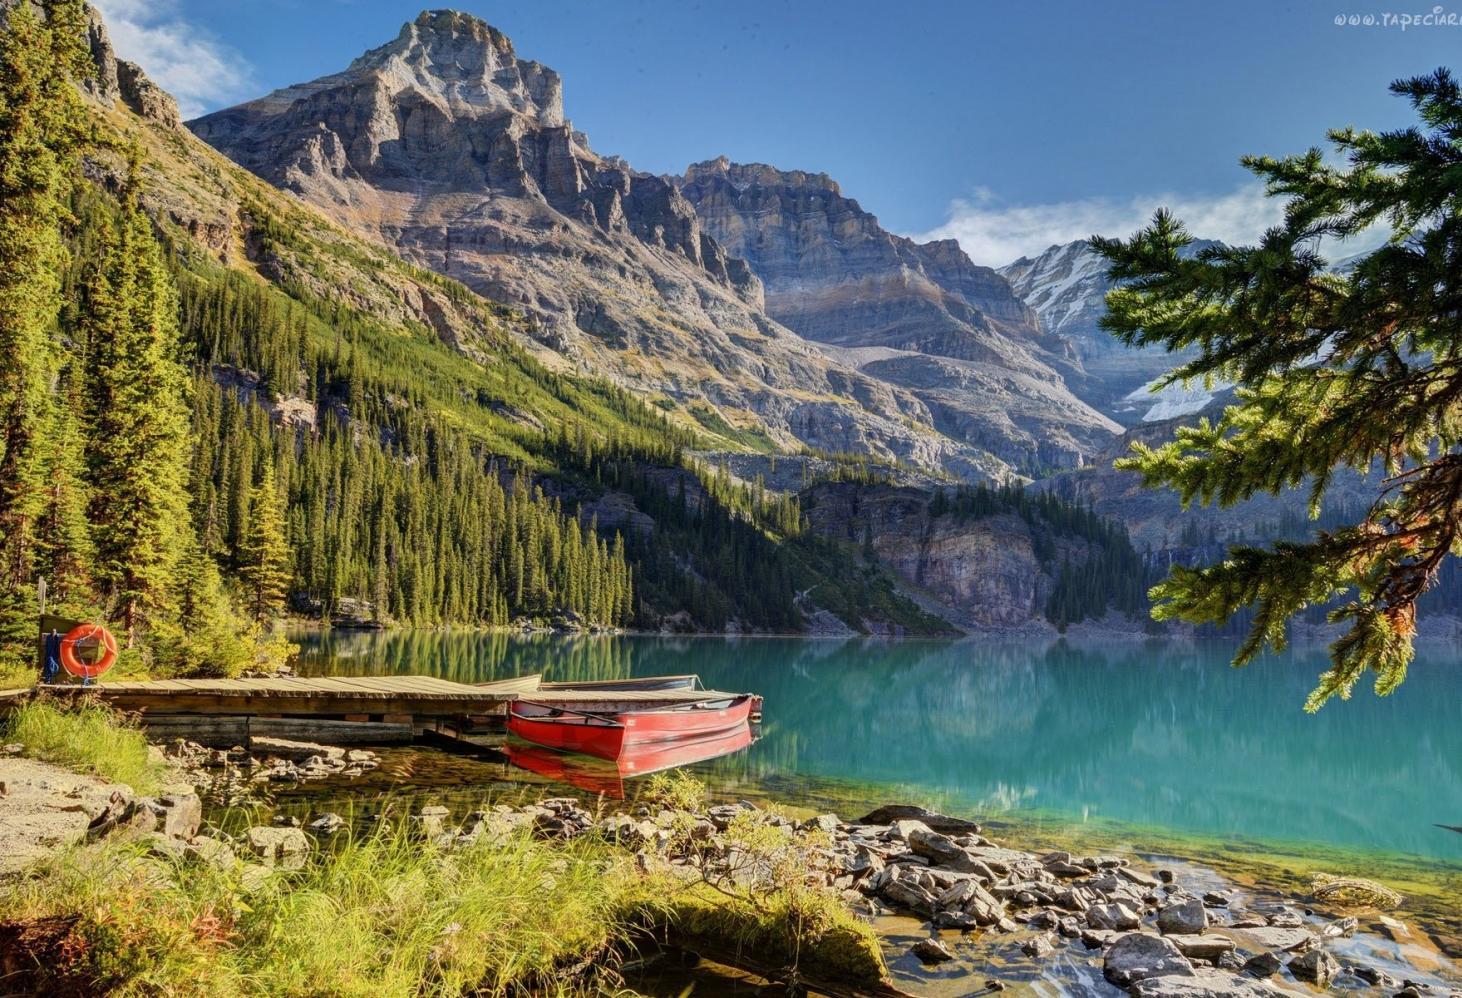 Озеро О'Хара (Lake O'Hara), Канада